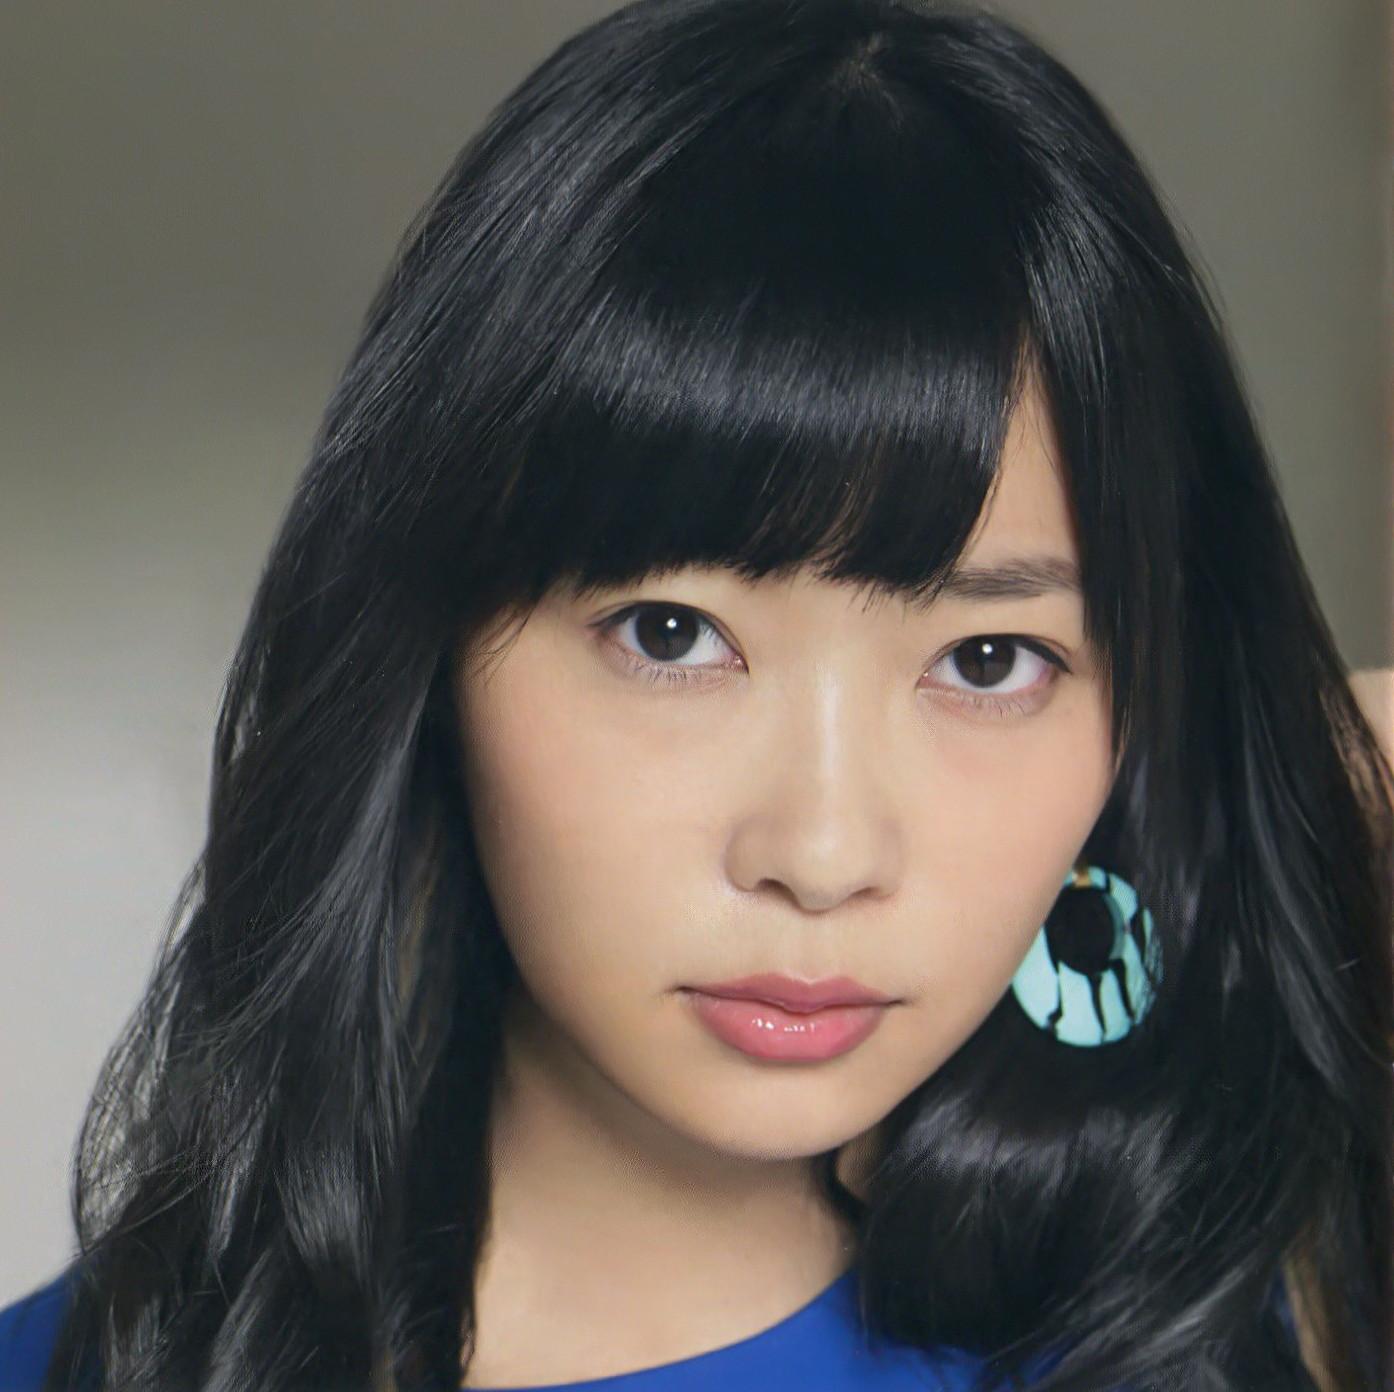 【AKB48】指原莉乃が来年にも卒業!?来年の総選挙は不出馬と決意のサムネイル画像